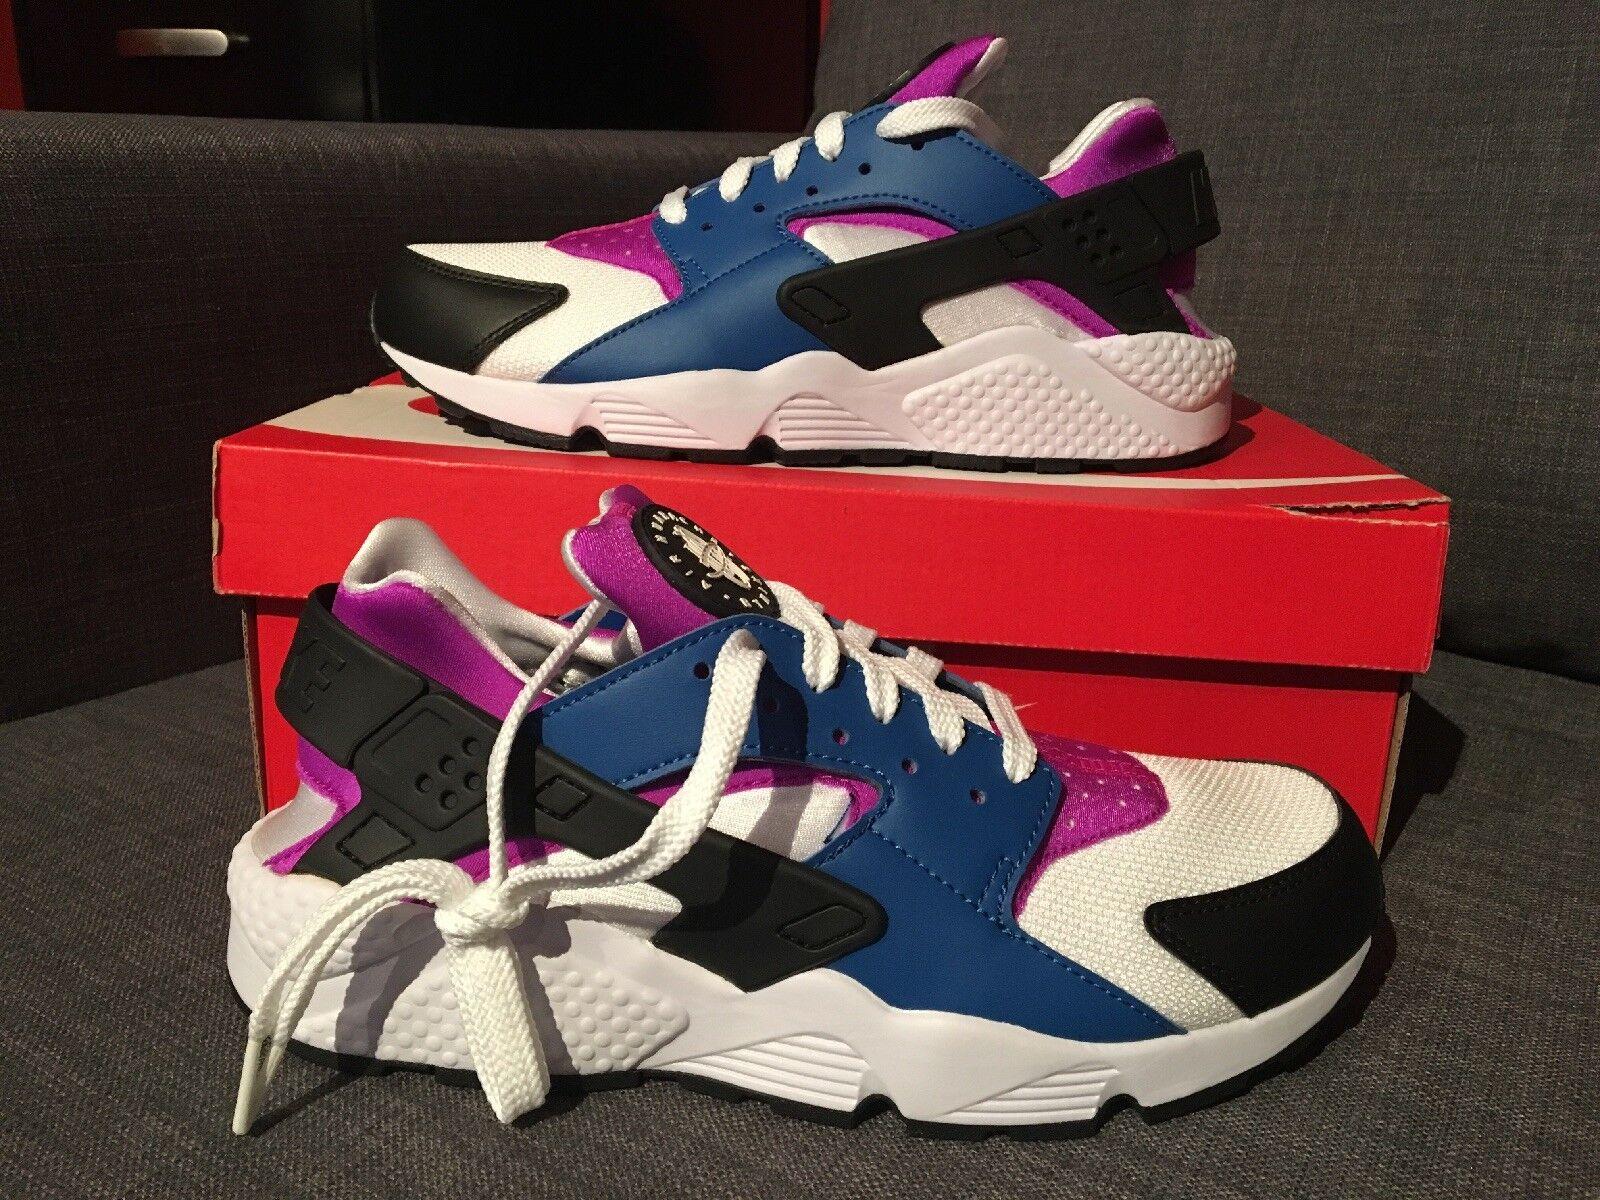 Nike Mens Air Huarache Blue Jay/Hyper Violet 318429-415 Mens Nike Size 9 11.5 12.5 ceb514